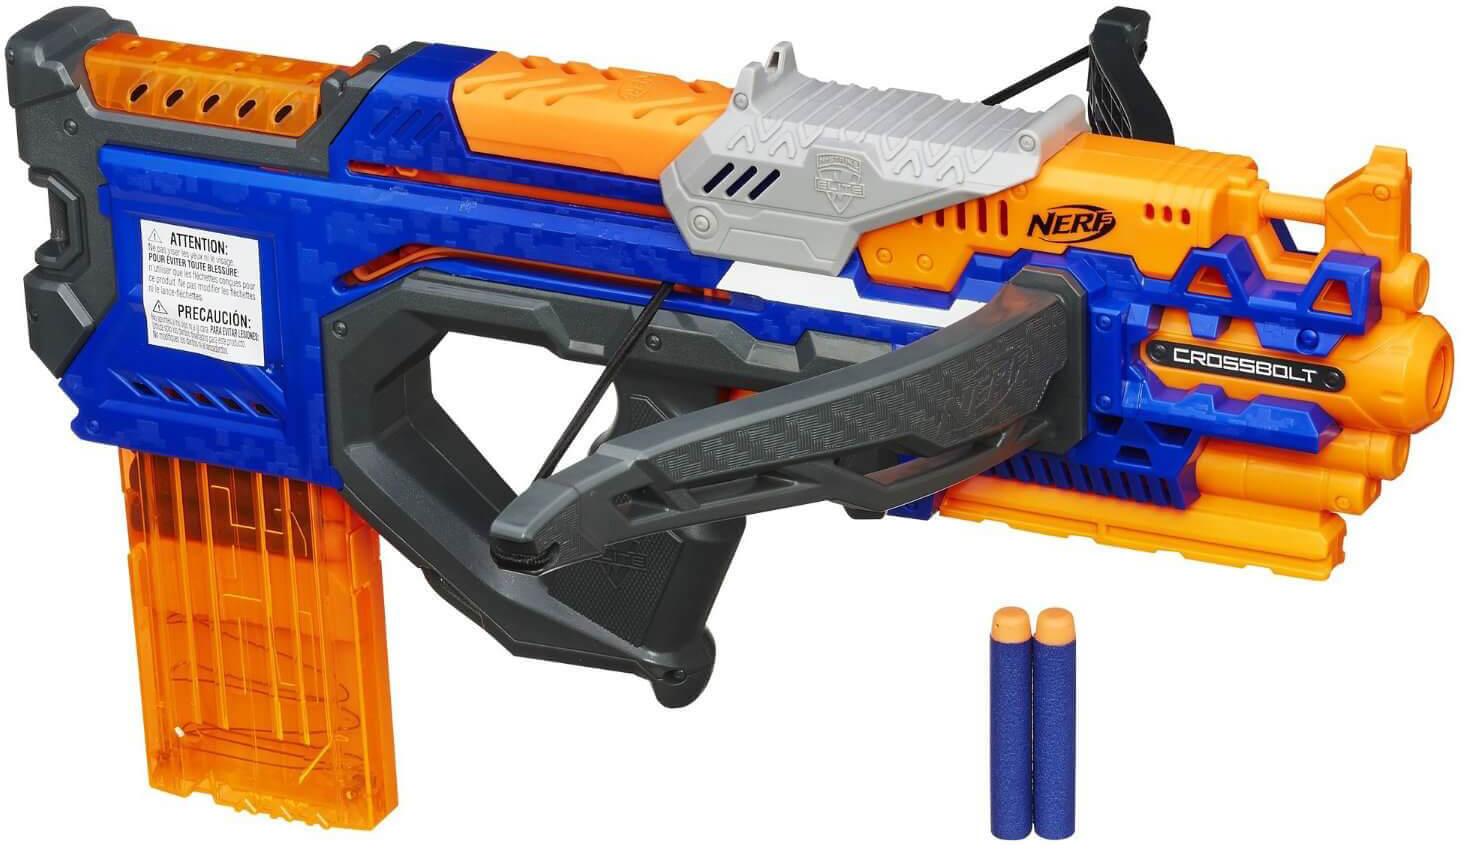 Mua đồ chơi Súng NERF A9317 - Súng NERF N-STRIKE ELITE CROSSBOLT BLASTER